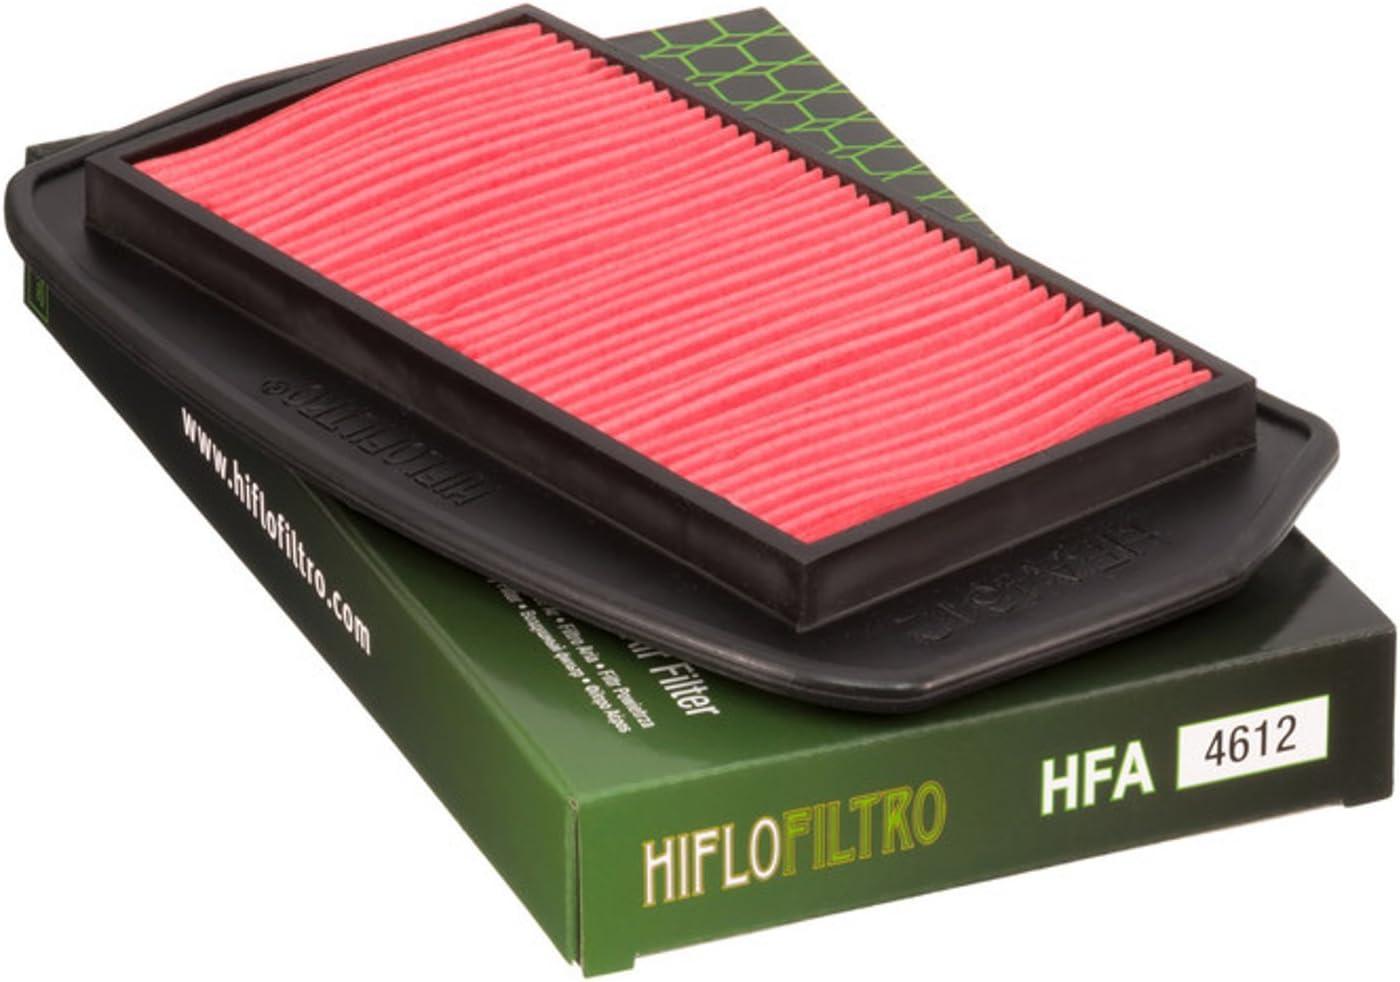 Luftfilter Hiflofilter Hfa4612 Yamaha Fz6 Fazer 600 S2 Auto